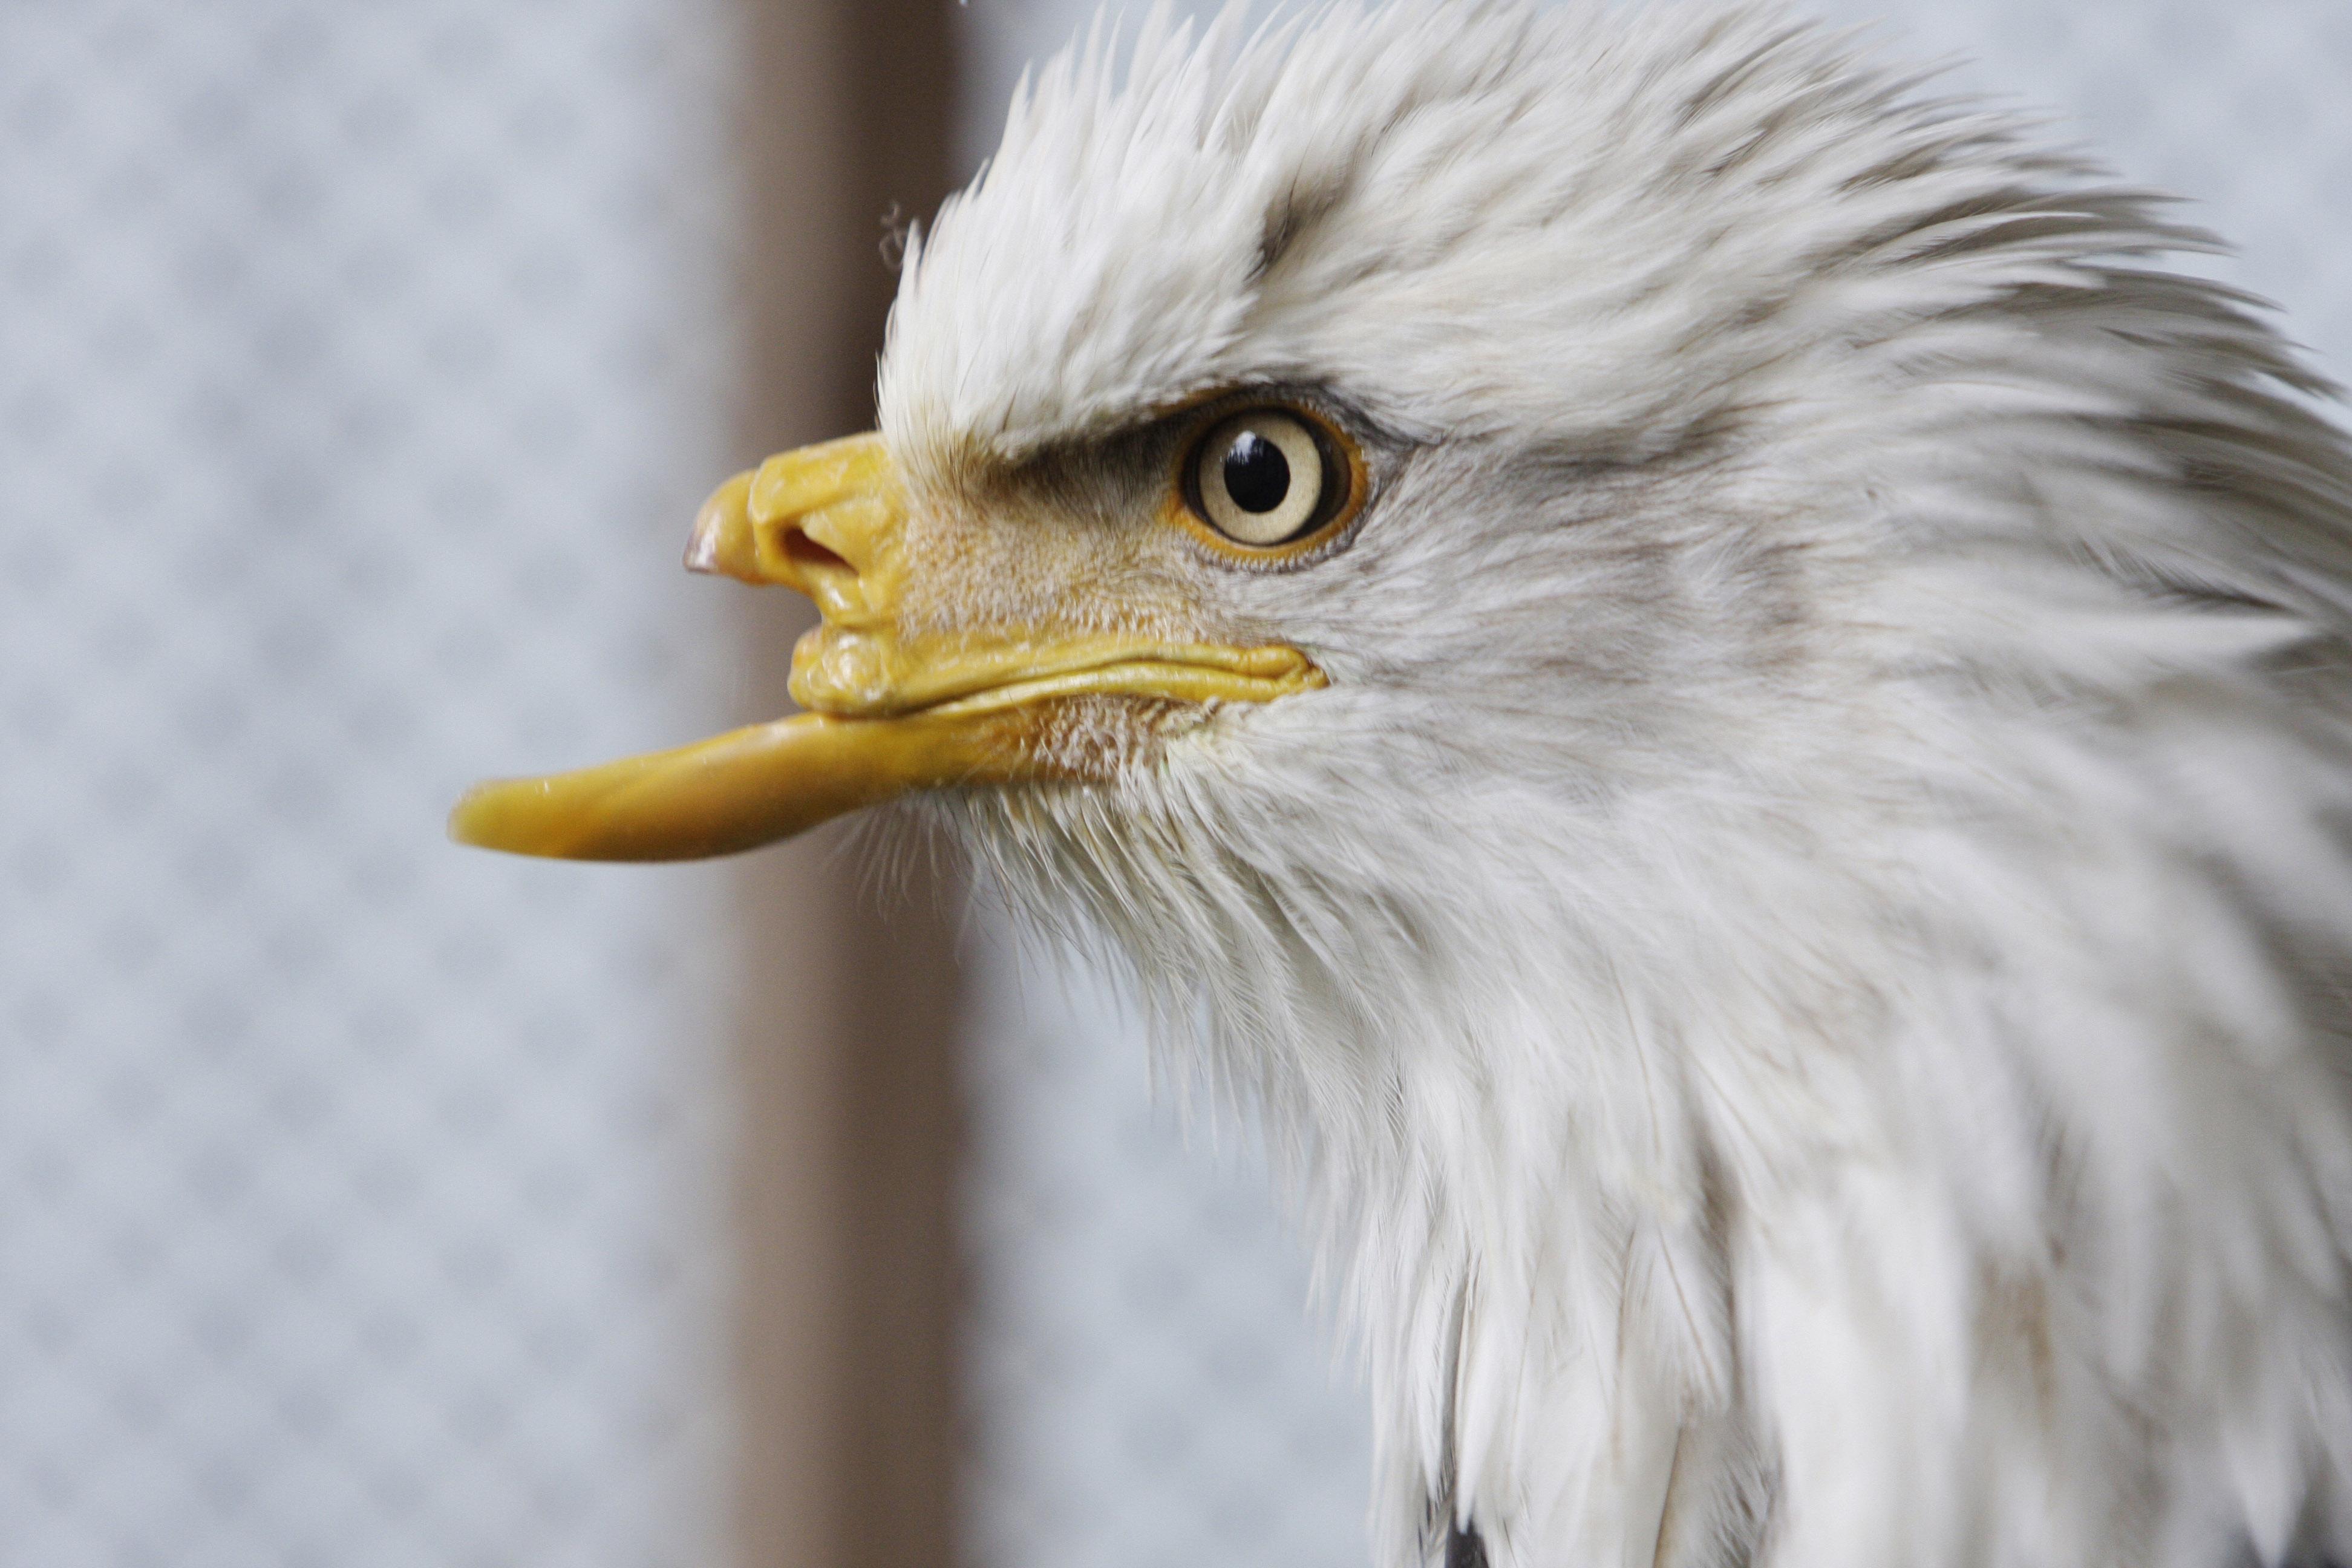 Eagle beak - photo#32